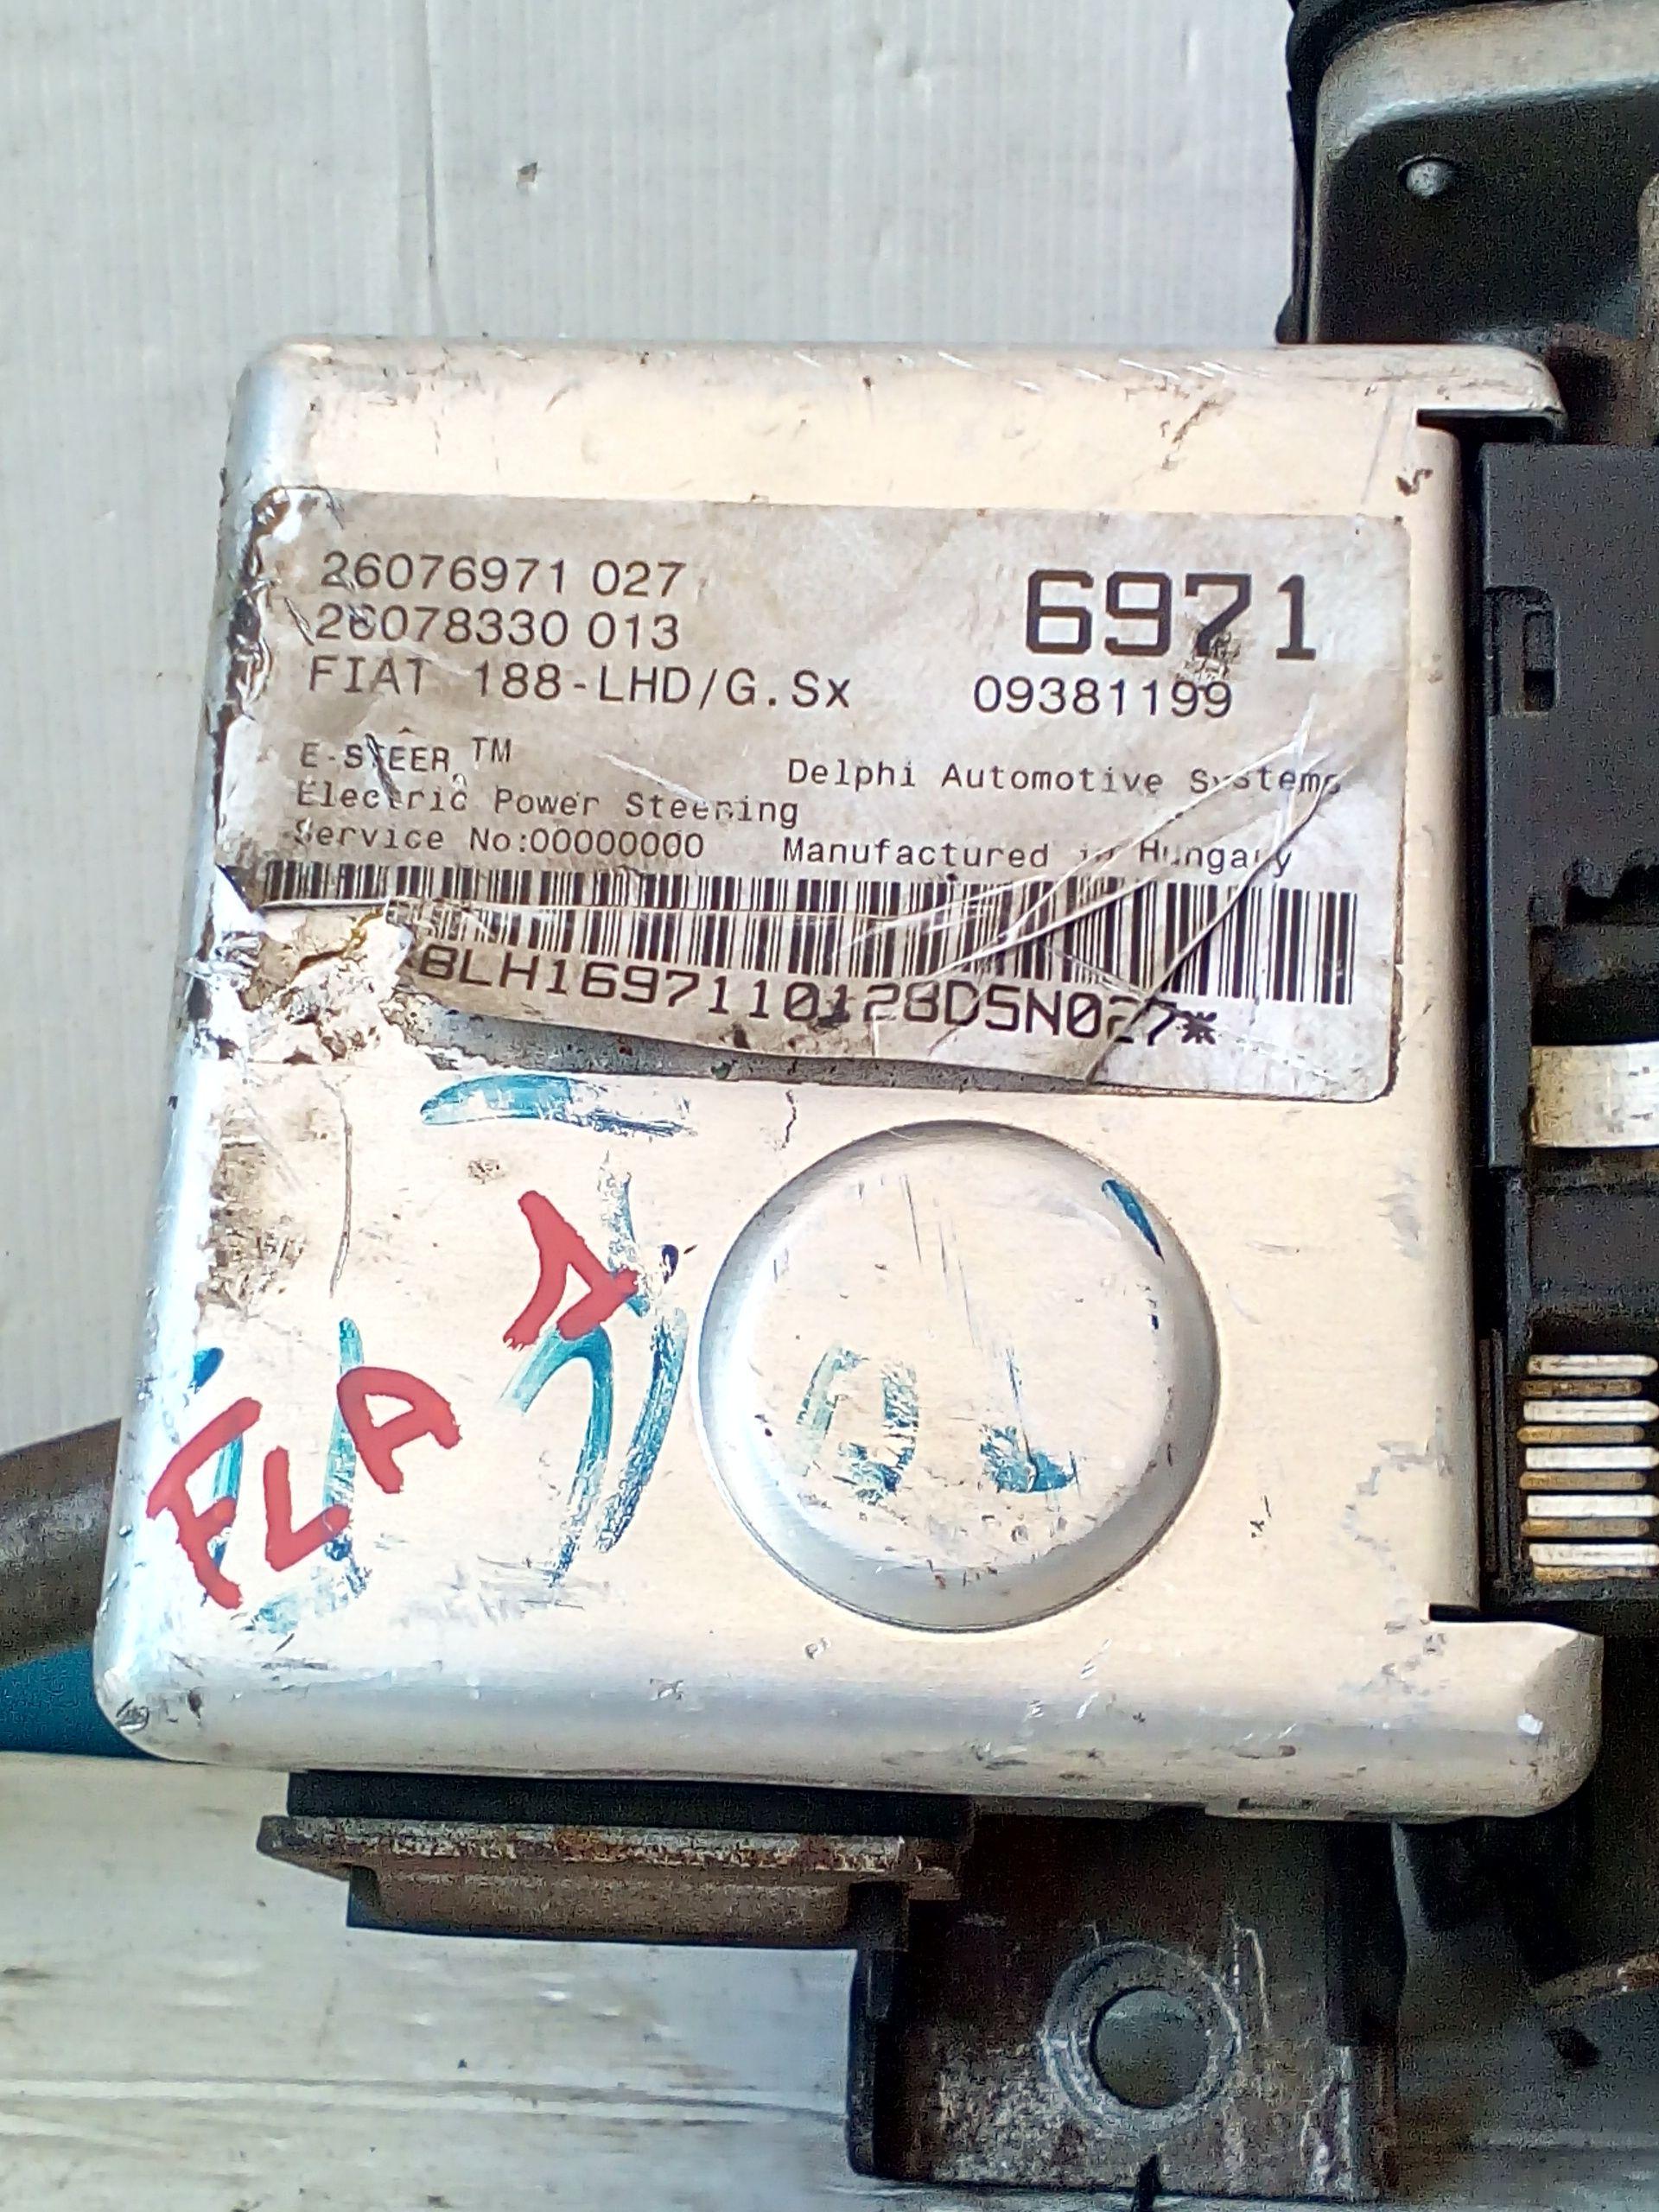 26076971 CENTRALINA SERVOSTERZO FIAT Punto Berlina 3P 2° Serie  Benzina    (1999) RICAMBI USATI